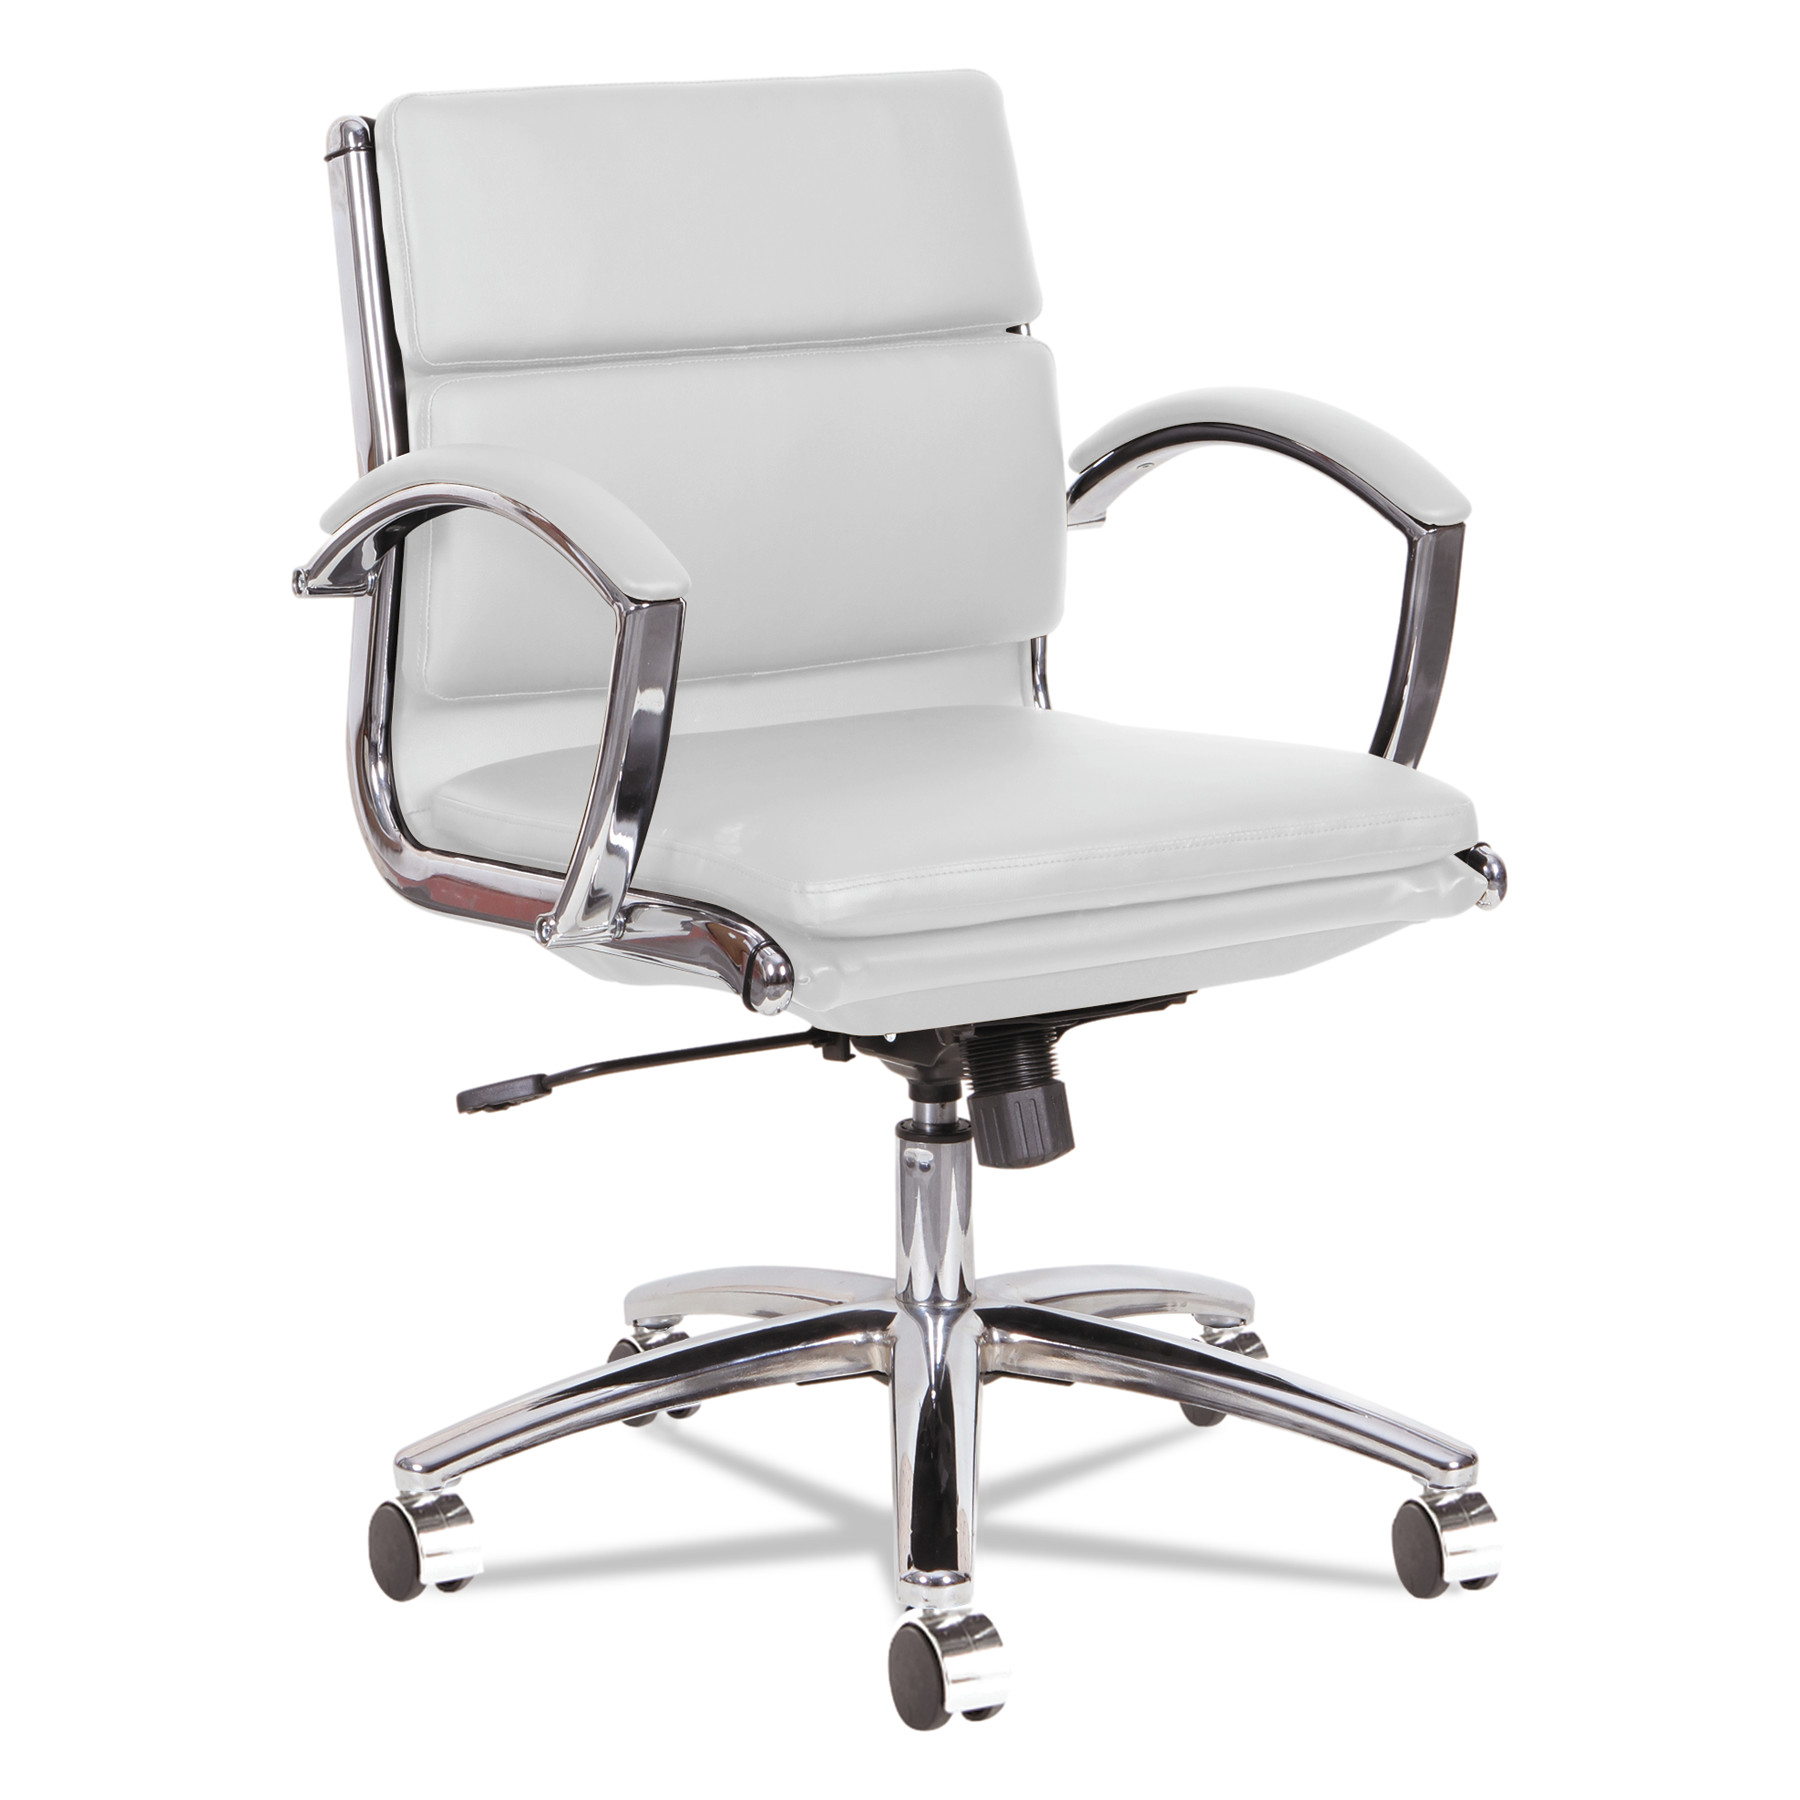 Alera Neratoli LowBack Slim Profile Chair White Faux